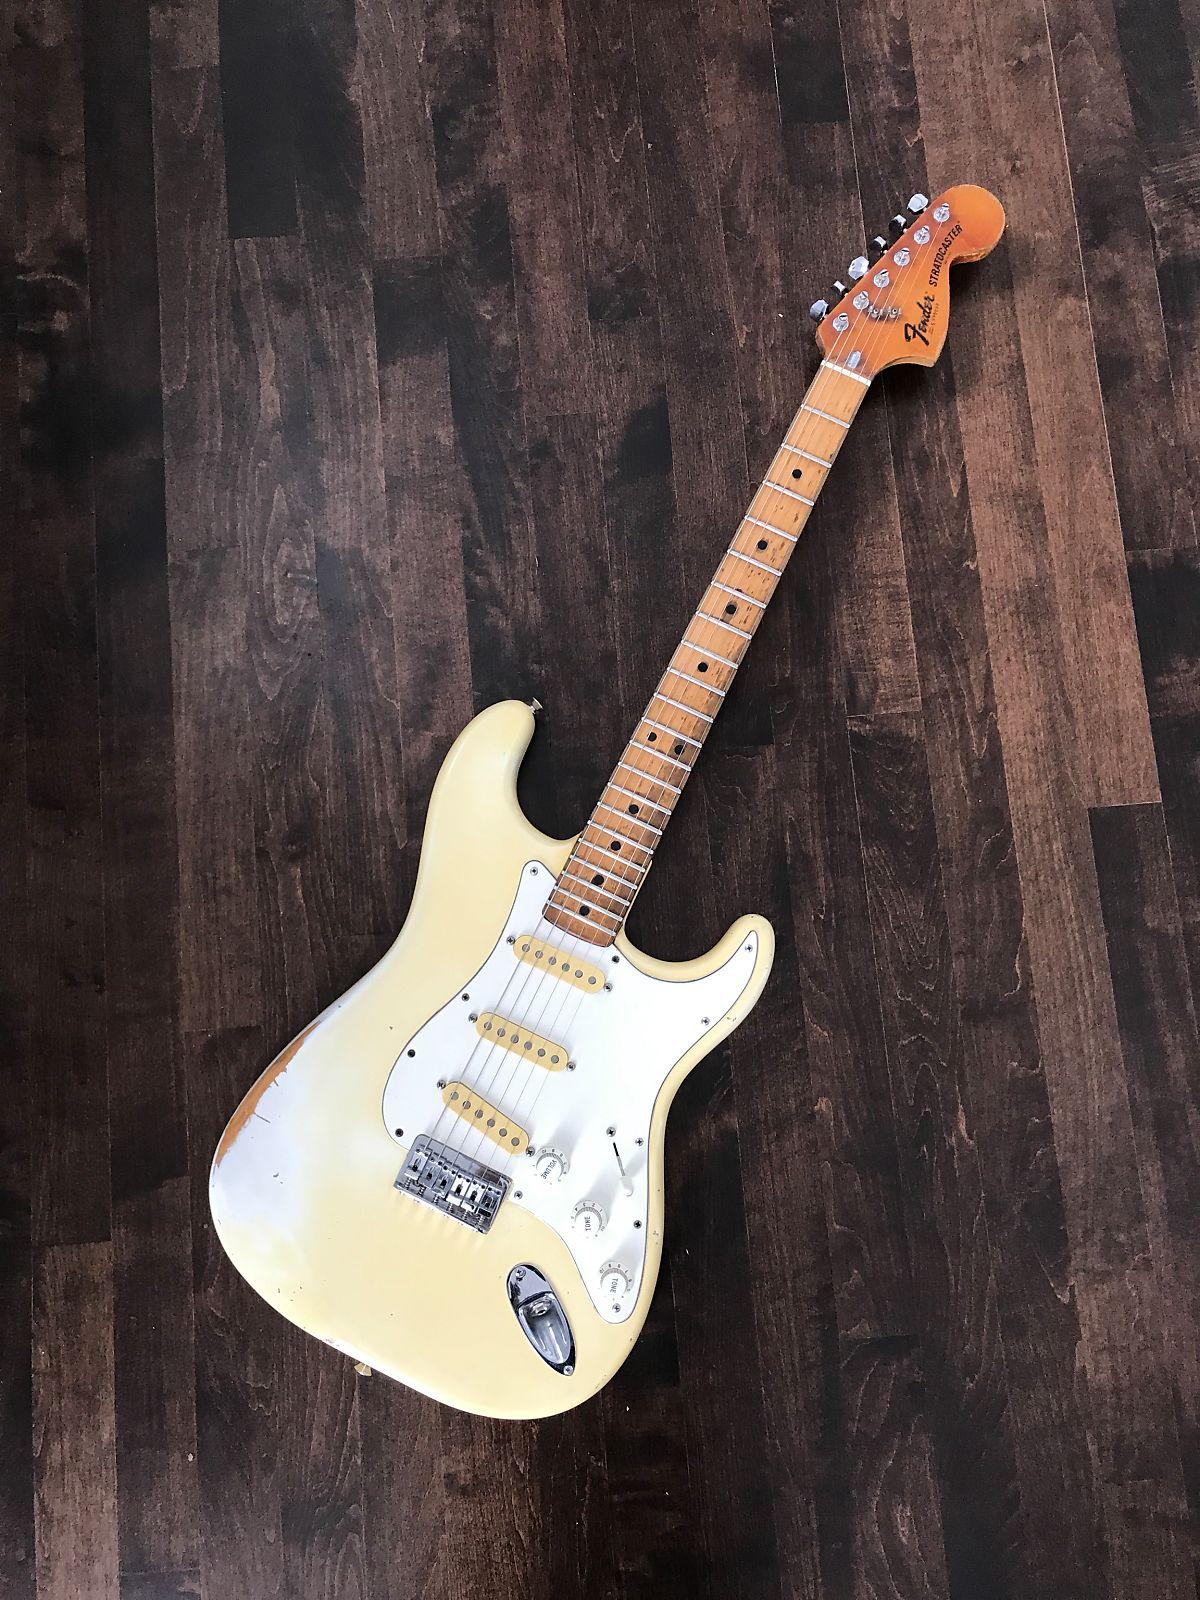 Fender  Stratocaster  1979 Olympic White with Orignal Hardshell Case